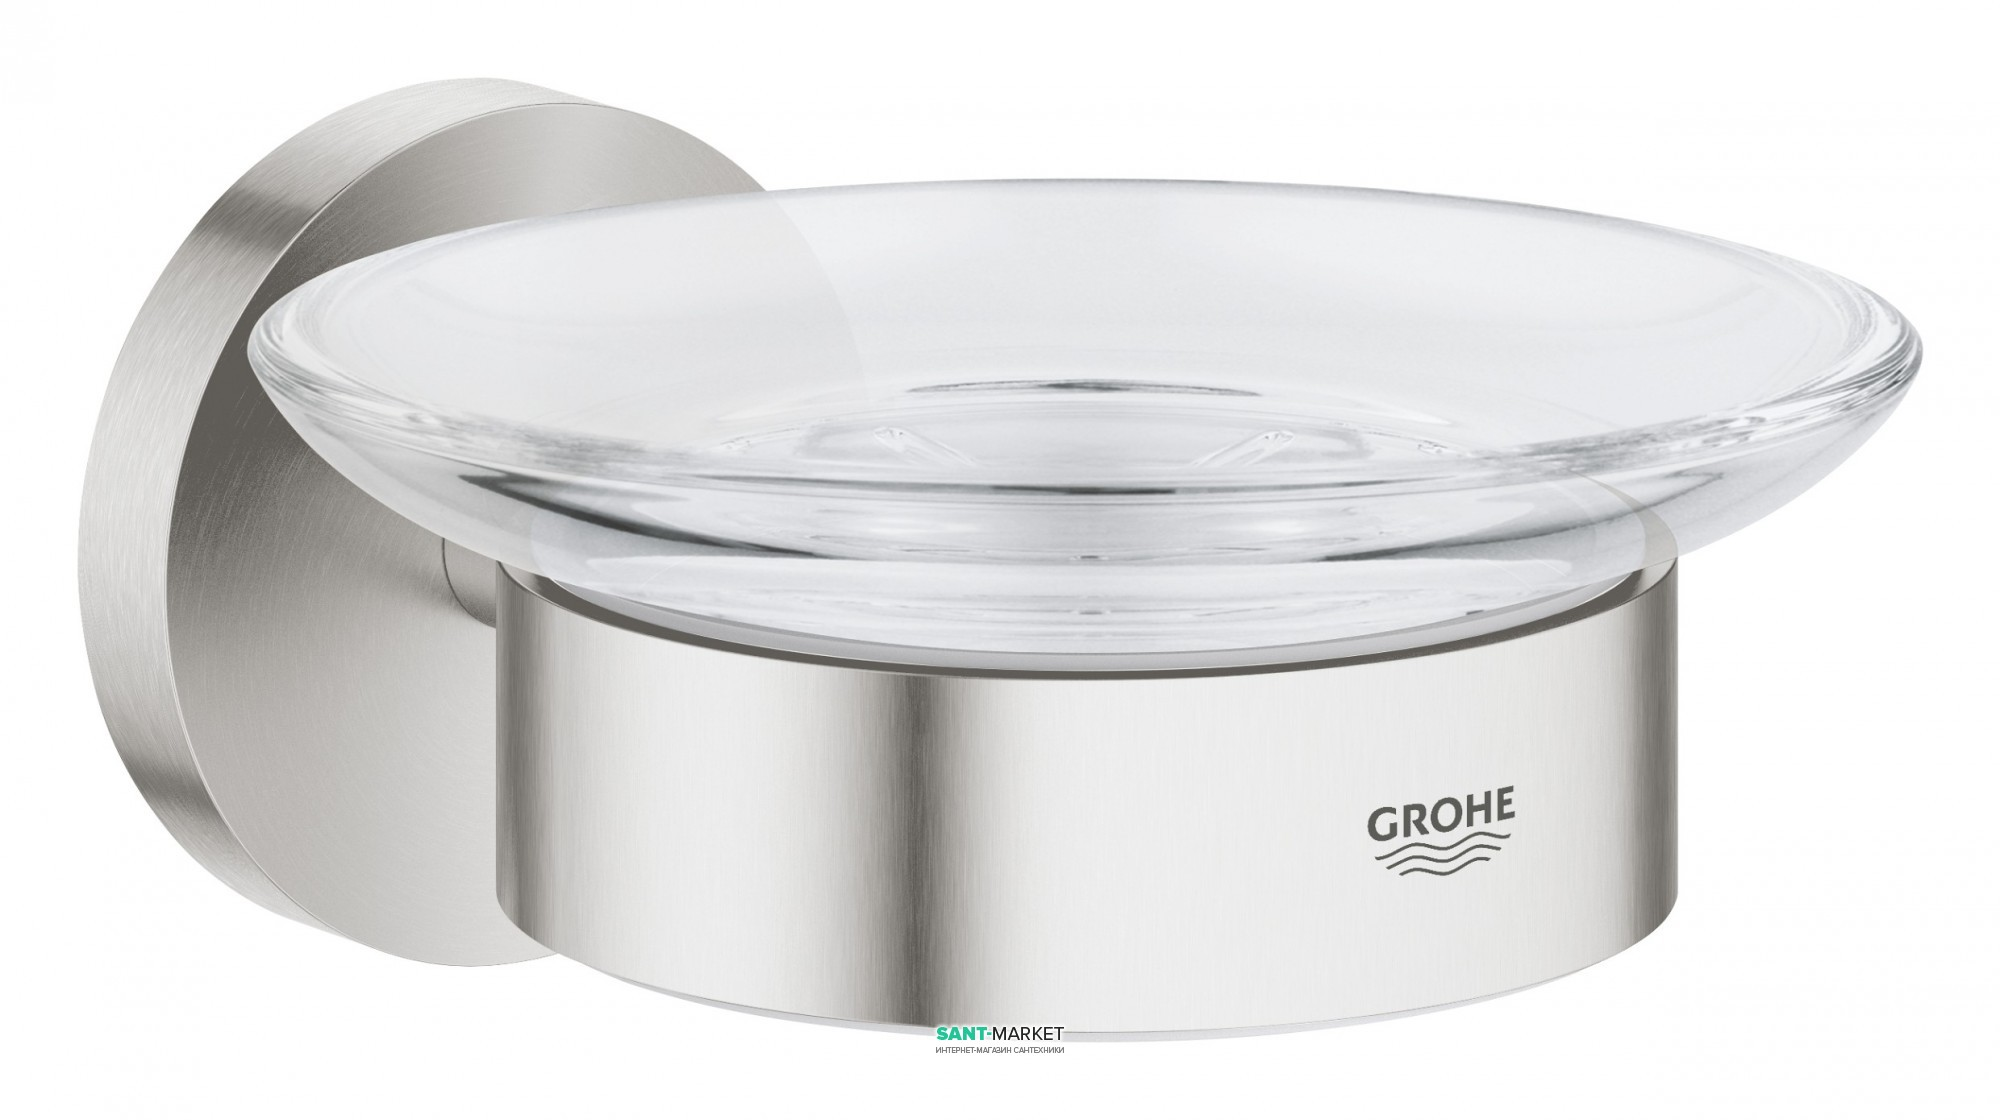 grohe Мыльница с держателем Grohe Essentials суперсталь 40444DC1